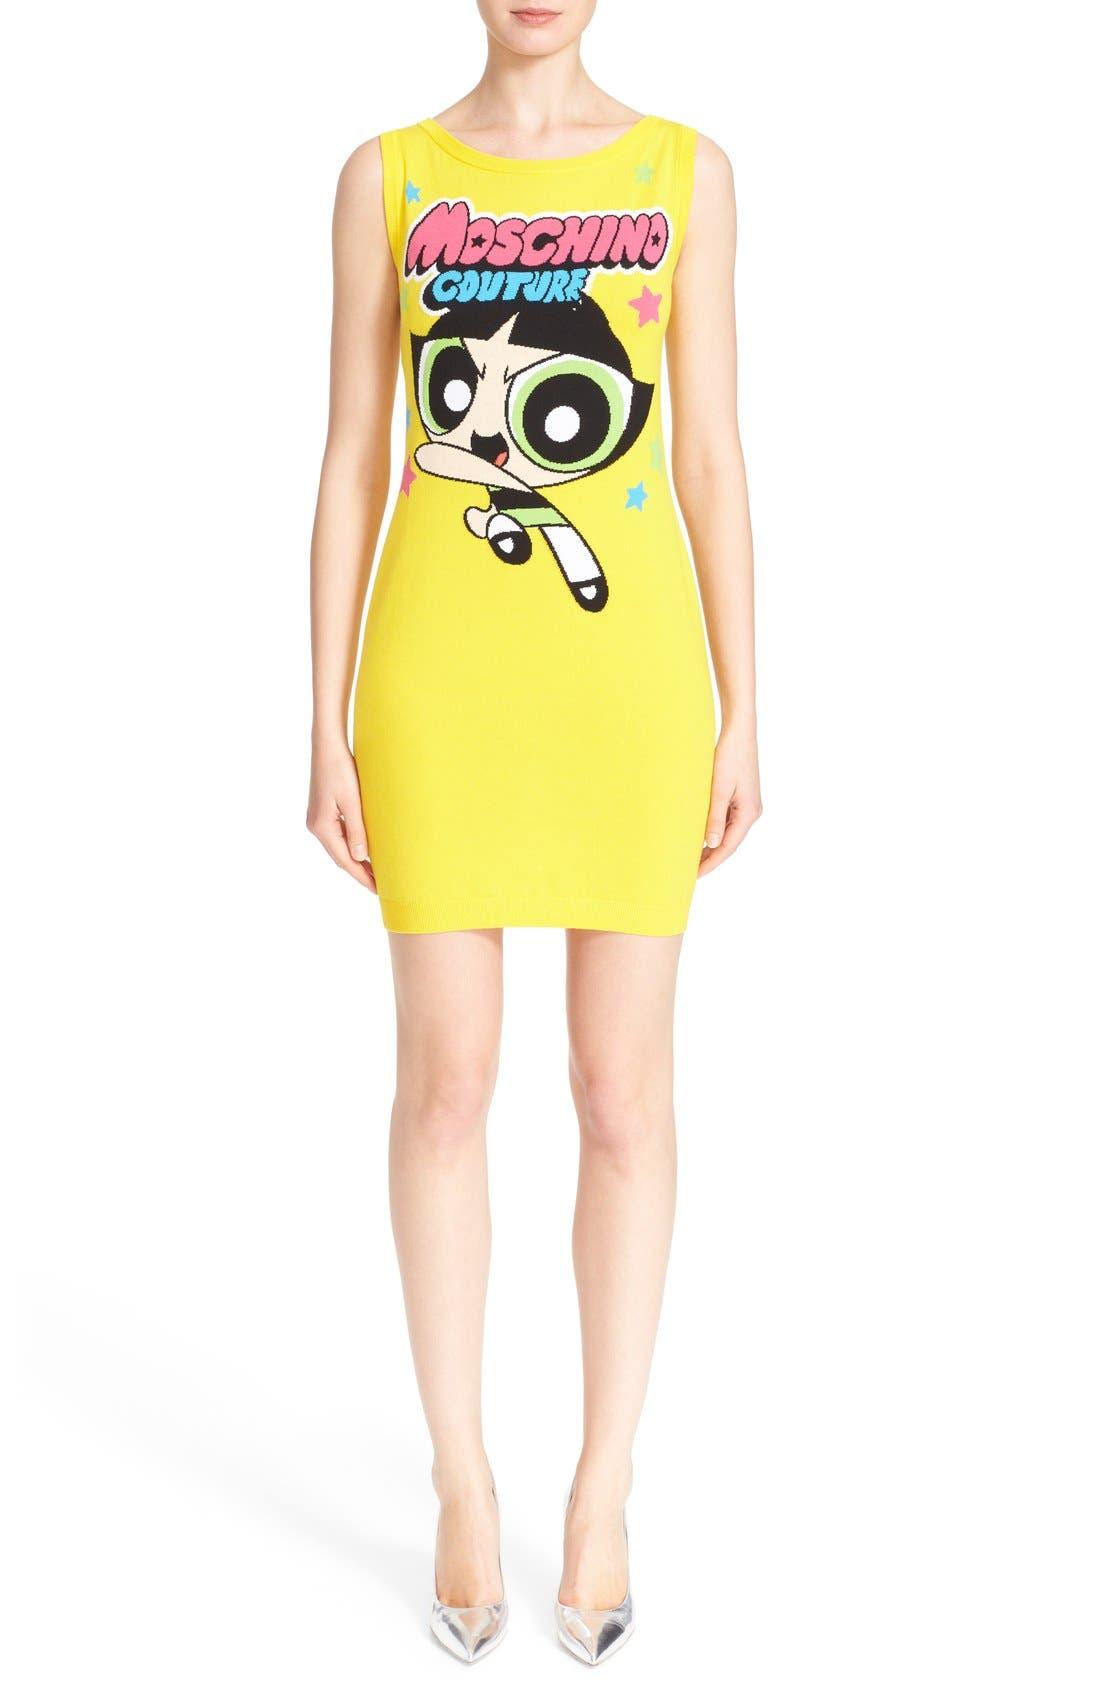 Main Image - Moschino 'The Powerpuff Girls® - Buttercup' Intarsia Knit Dress